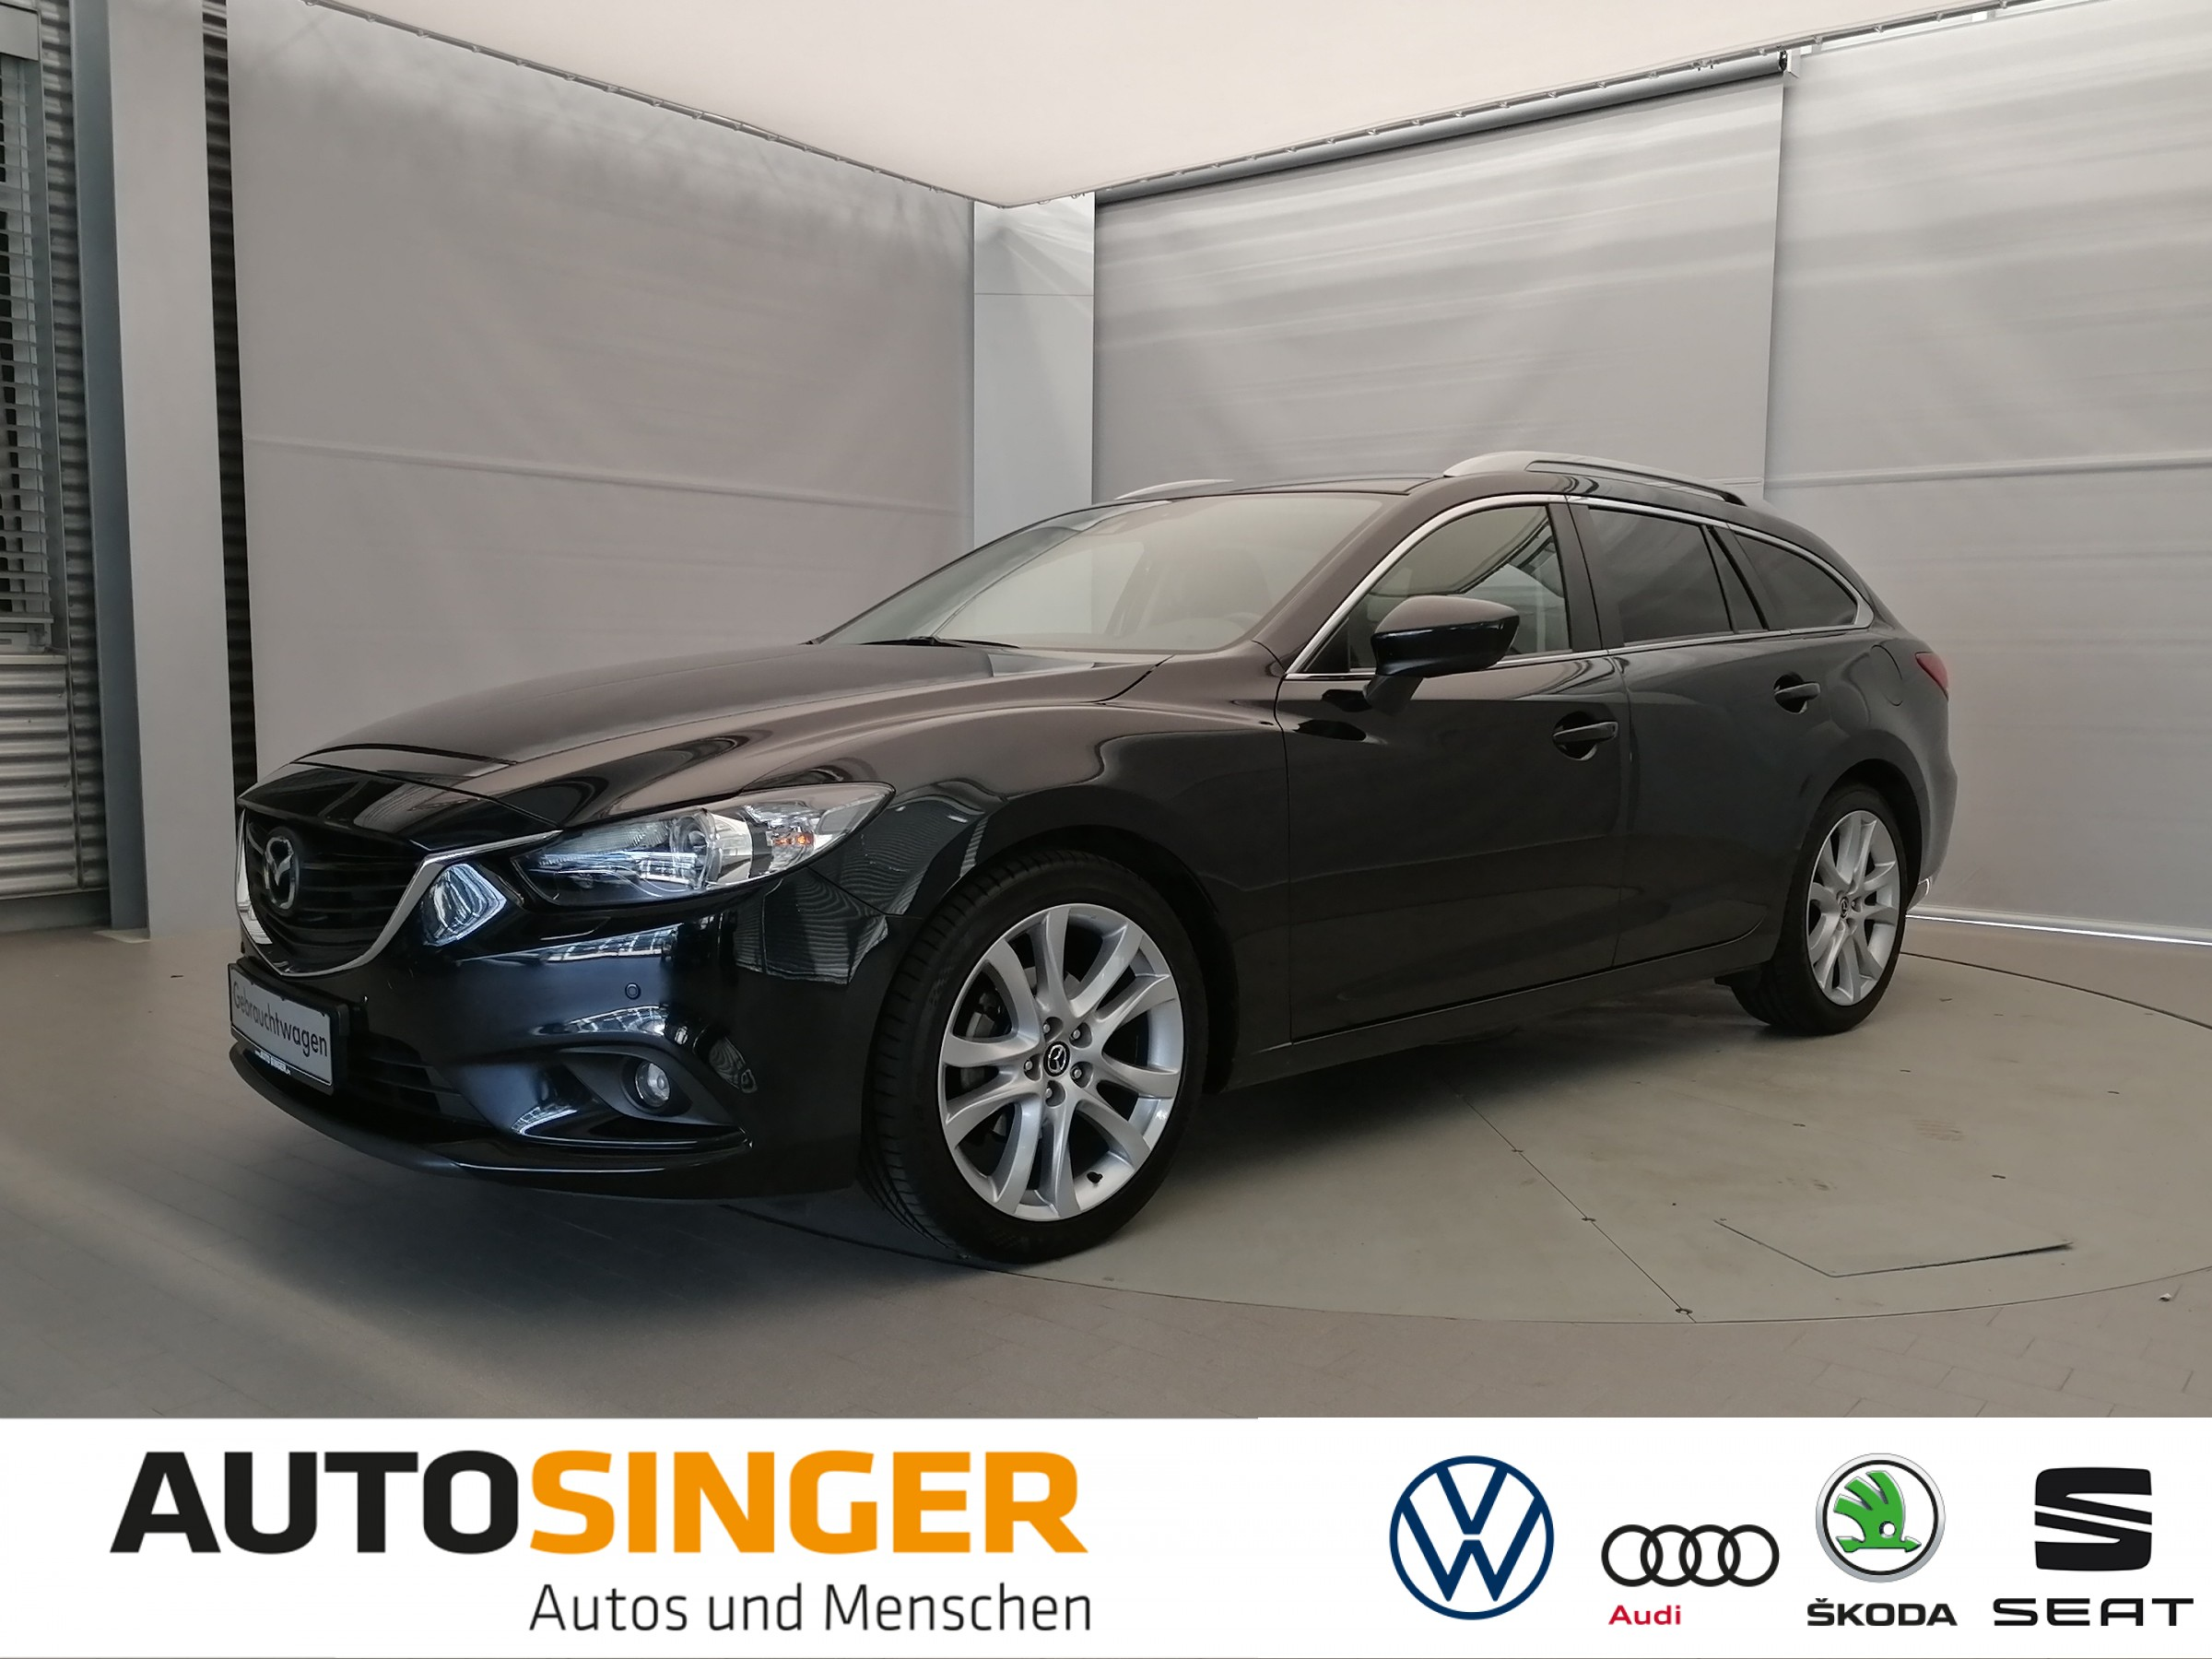 Mazda 6 Kombi 2,0 SKYACTIV - G *NAVI*XENON*SHZ*PDC*, Jahr 2013, Benzin